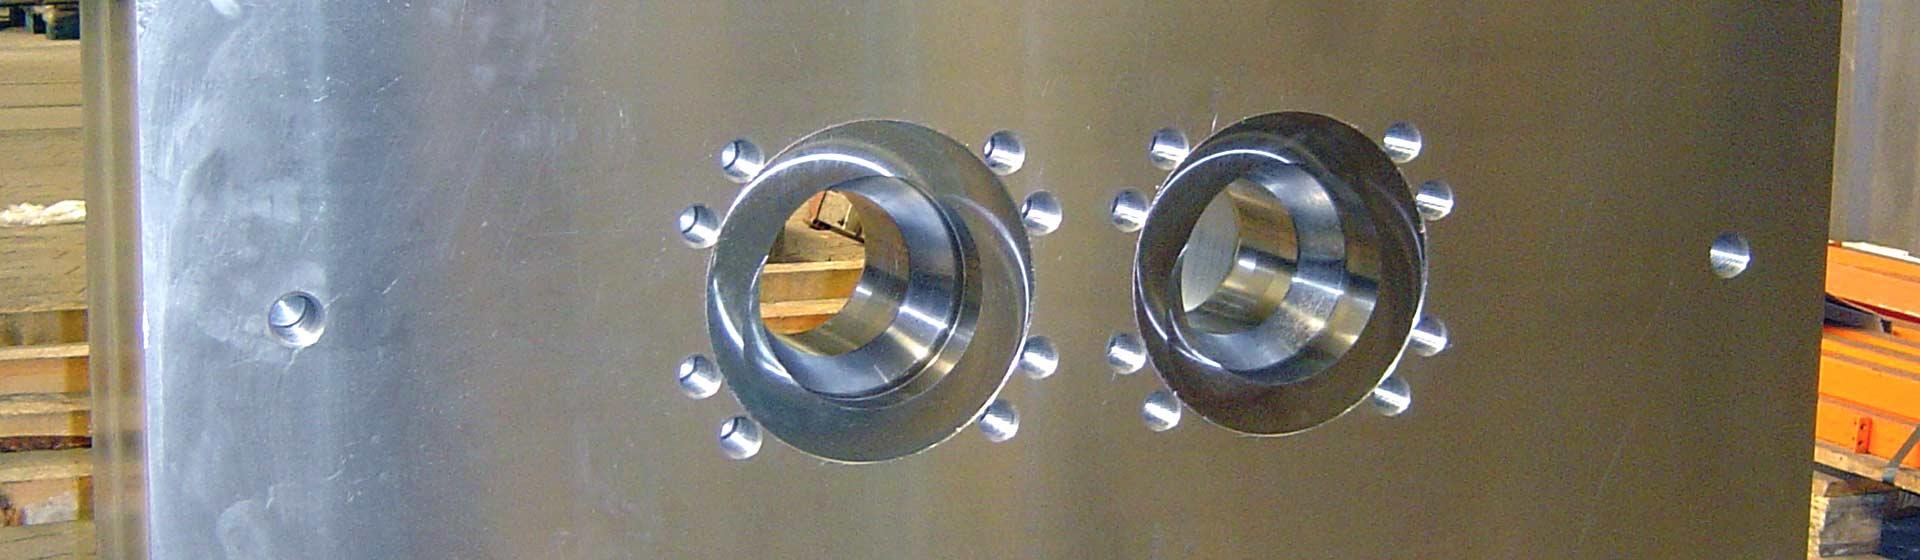 Degler GmbH Maschinenbauelemente